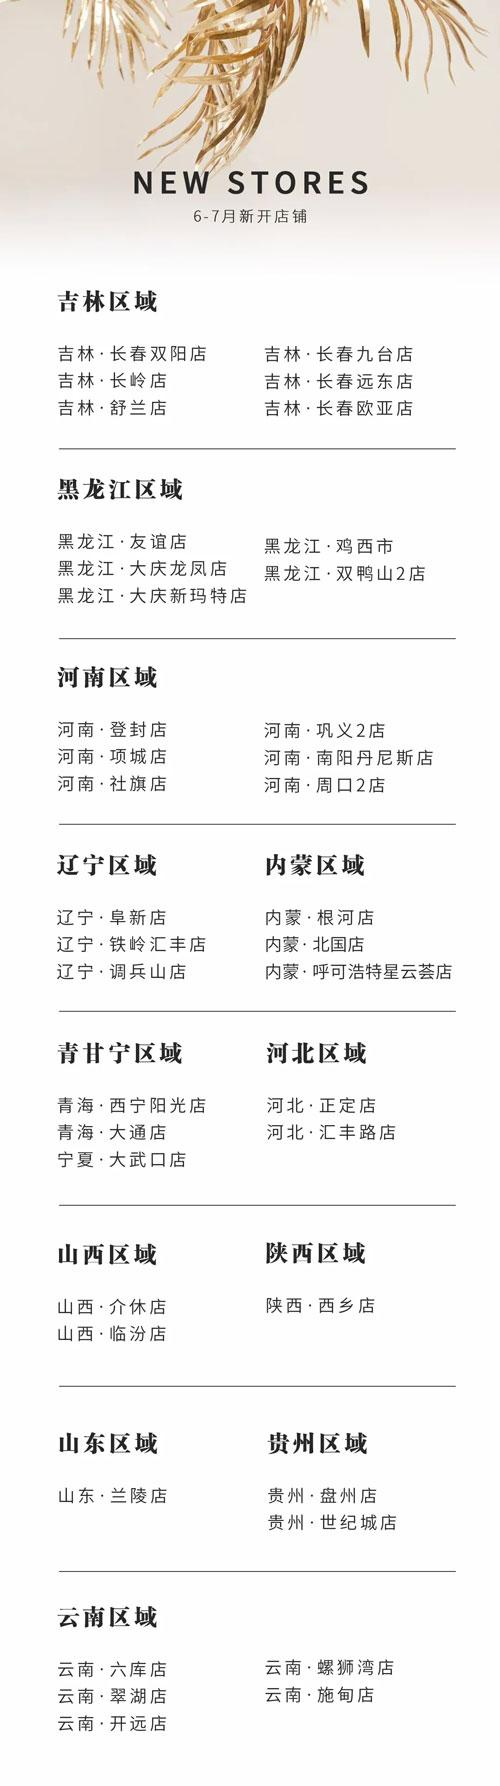 NEW OPEN 芝儀6-7月開店錦集 散發優雅從容魅力!